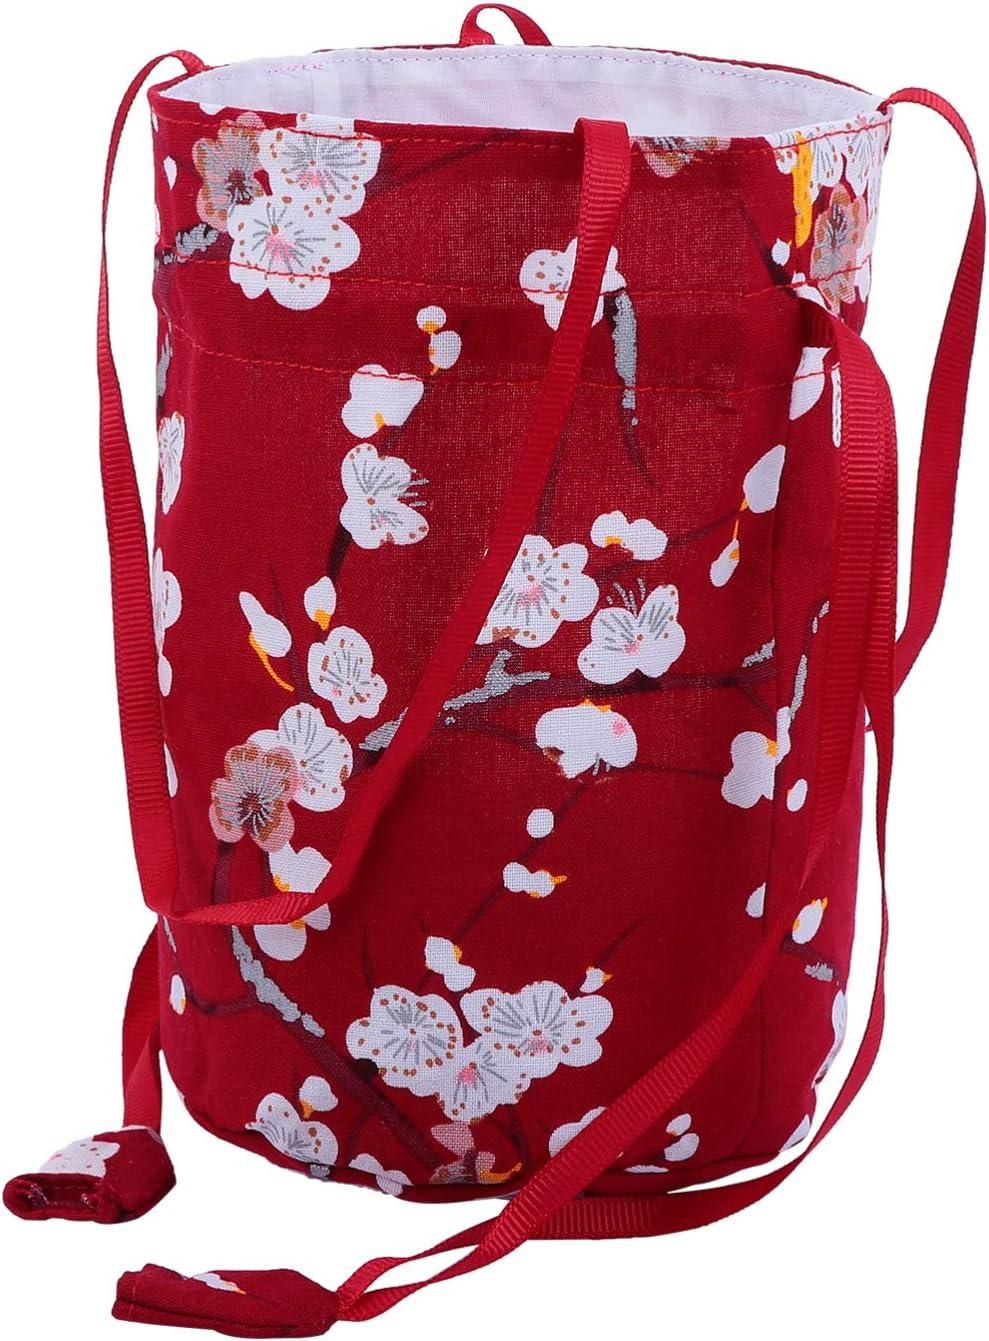 Popular popular NUOBESTY Japanese Drawstring Bag High quality new Kimono Purse Pouch Bloss Cherry